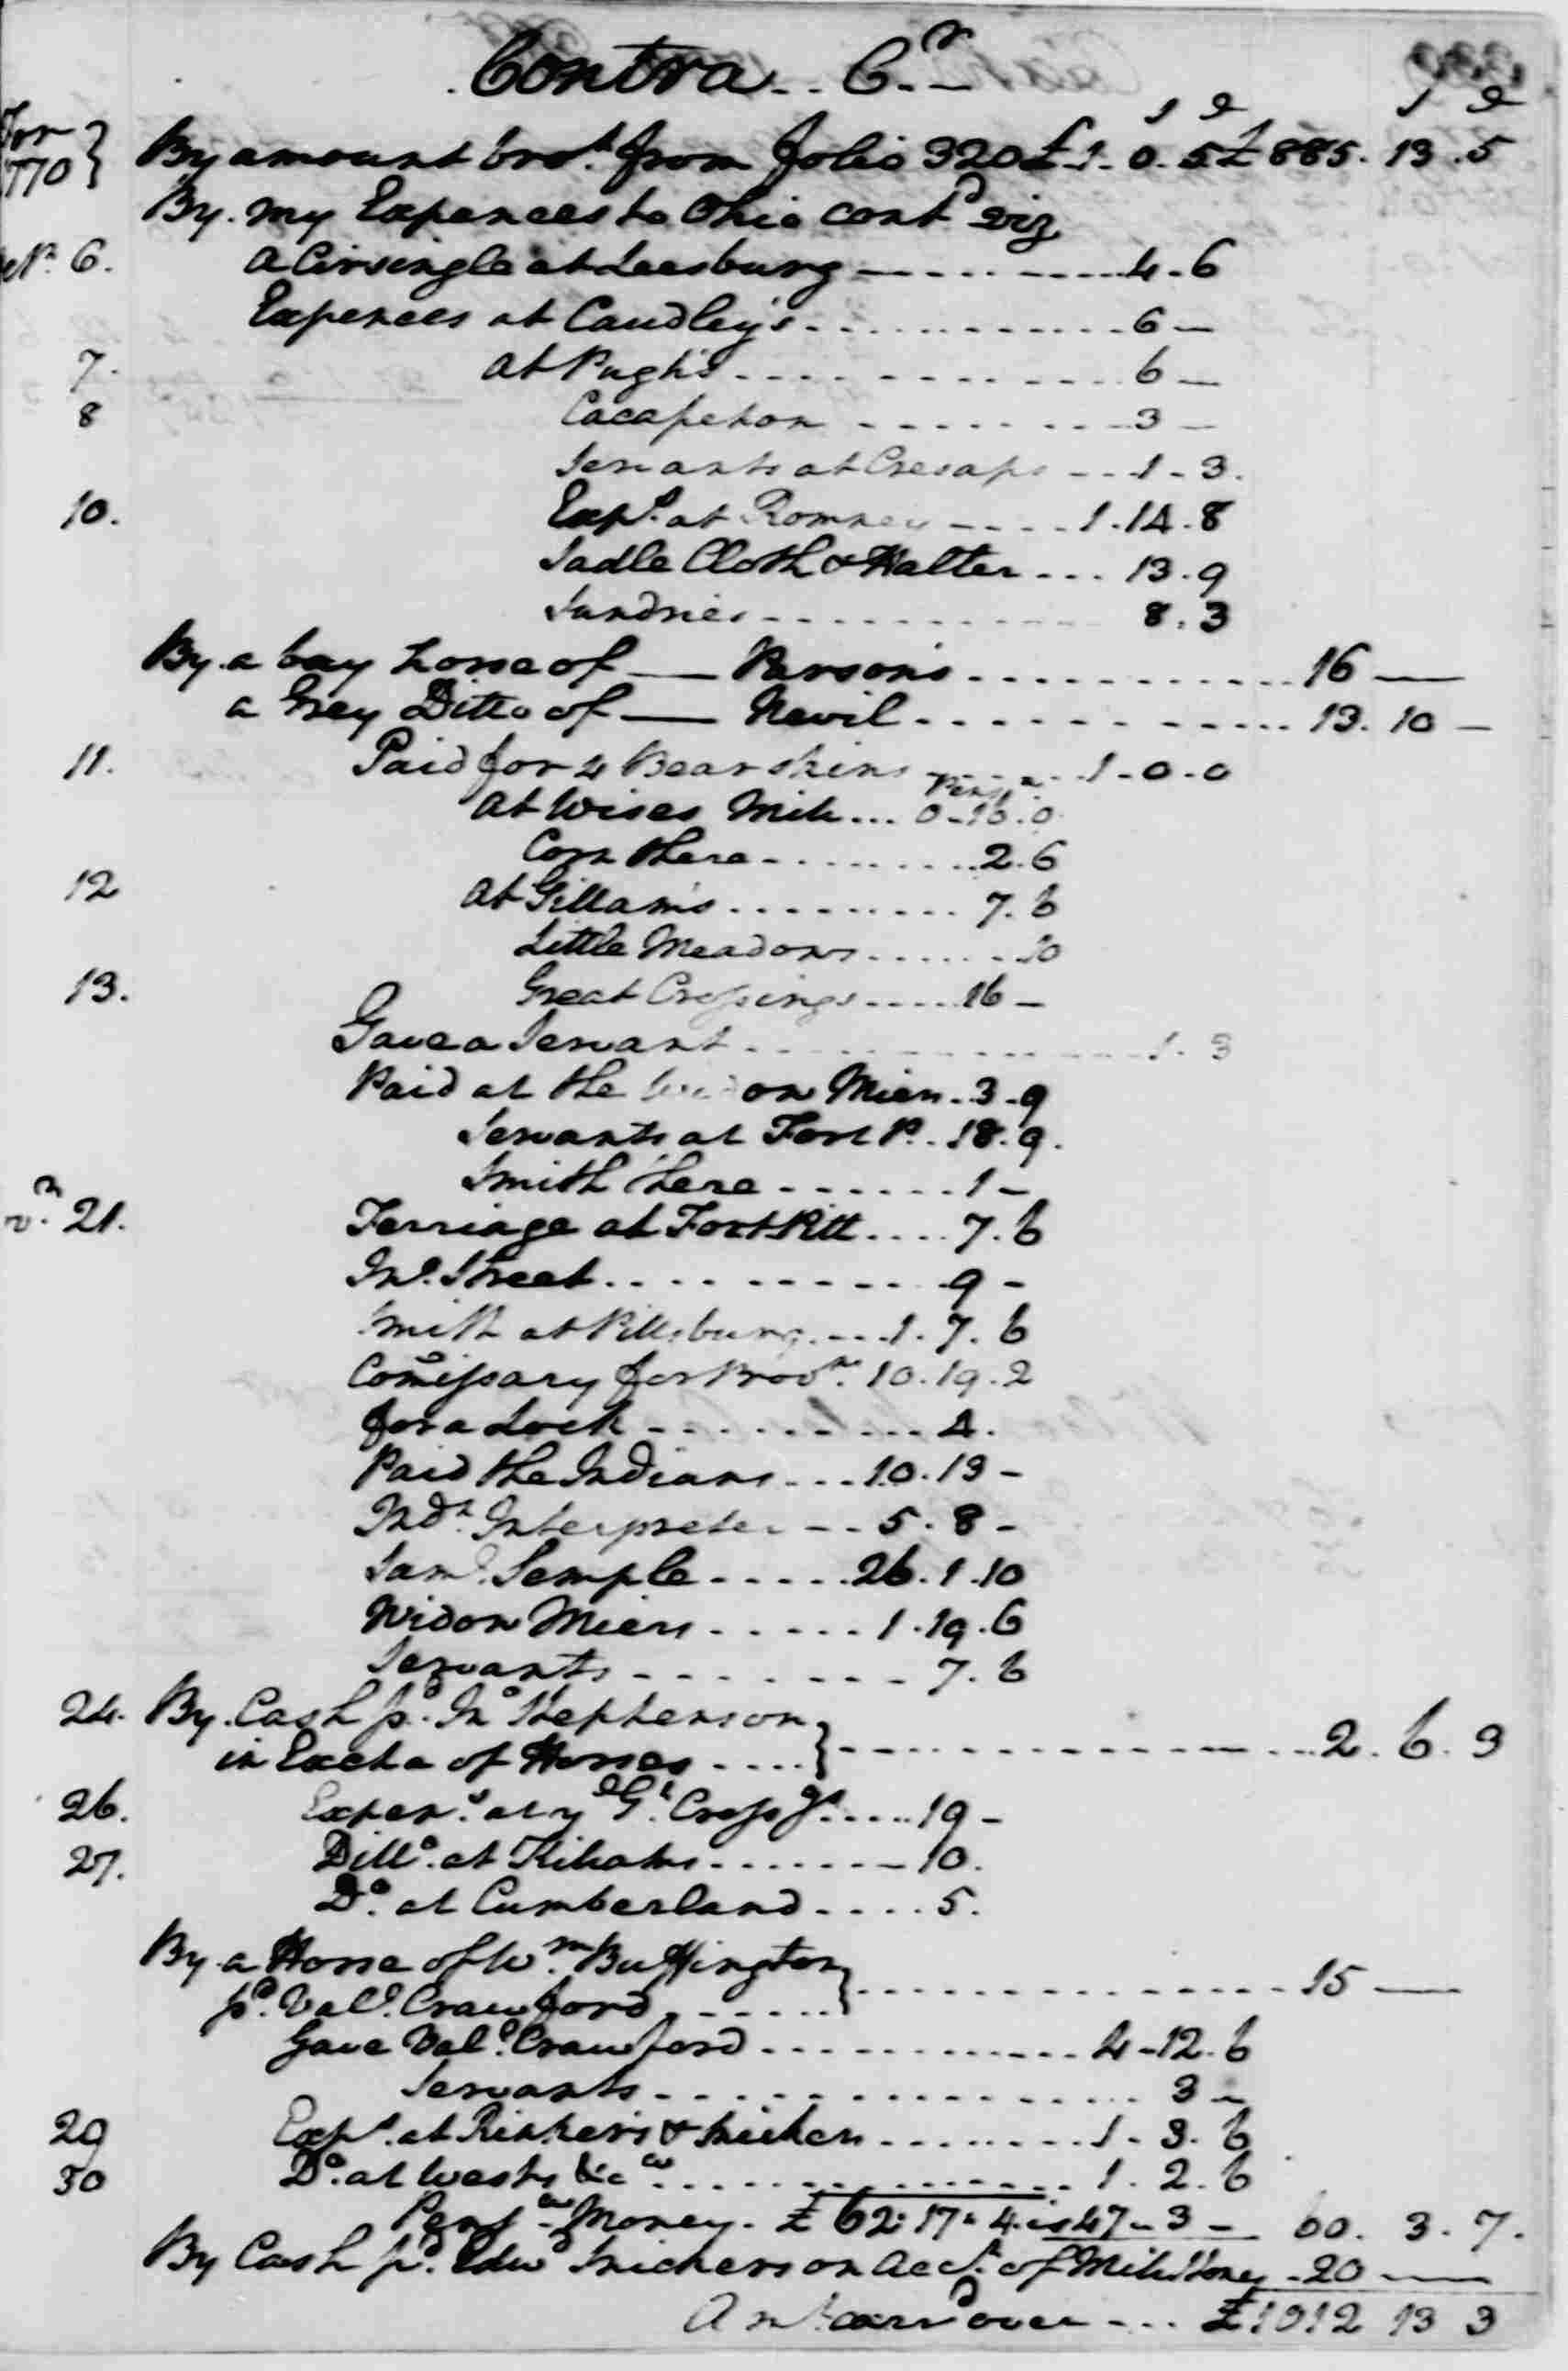 Ledger A, folio 329, right side